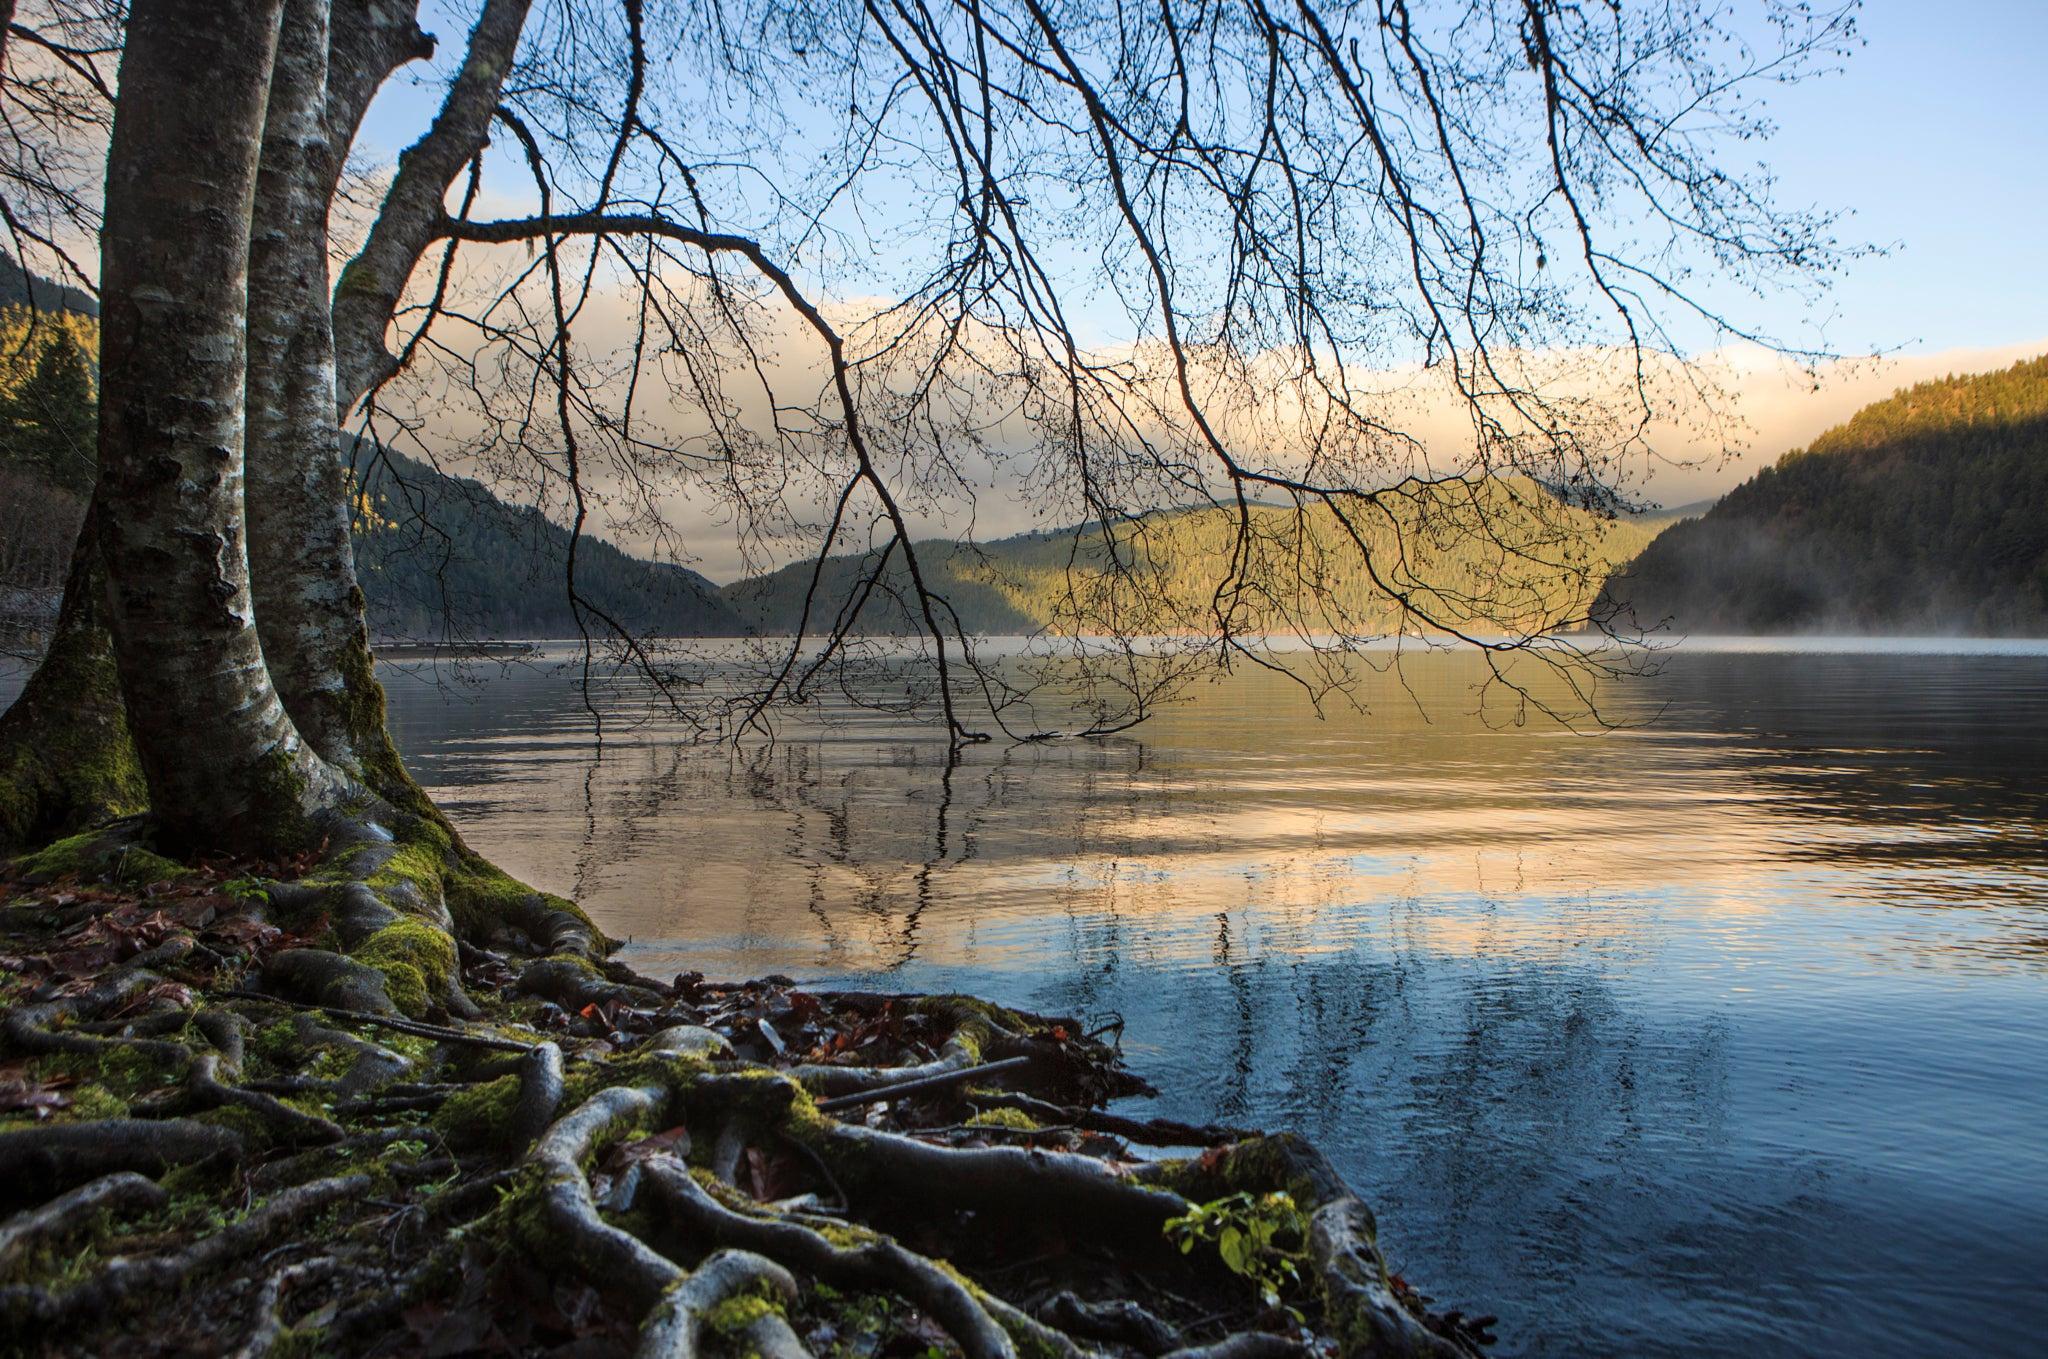 горы озеро деревья корни mountains the lake trees roots бесплатно